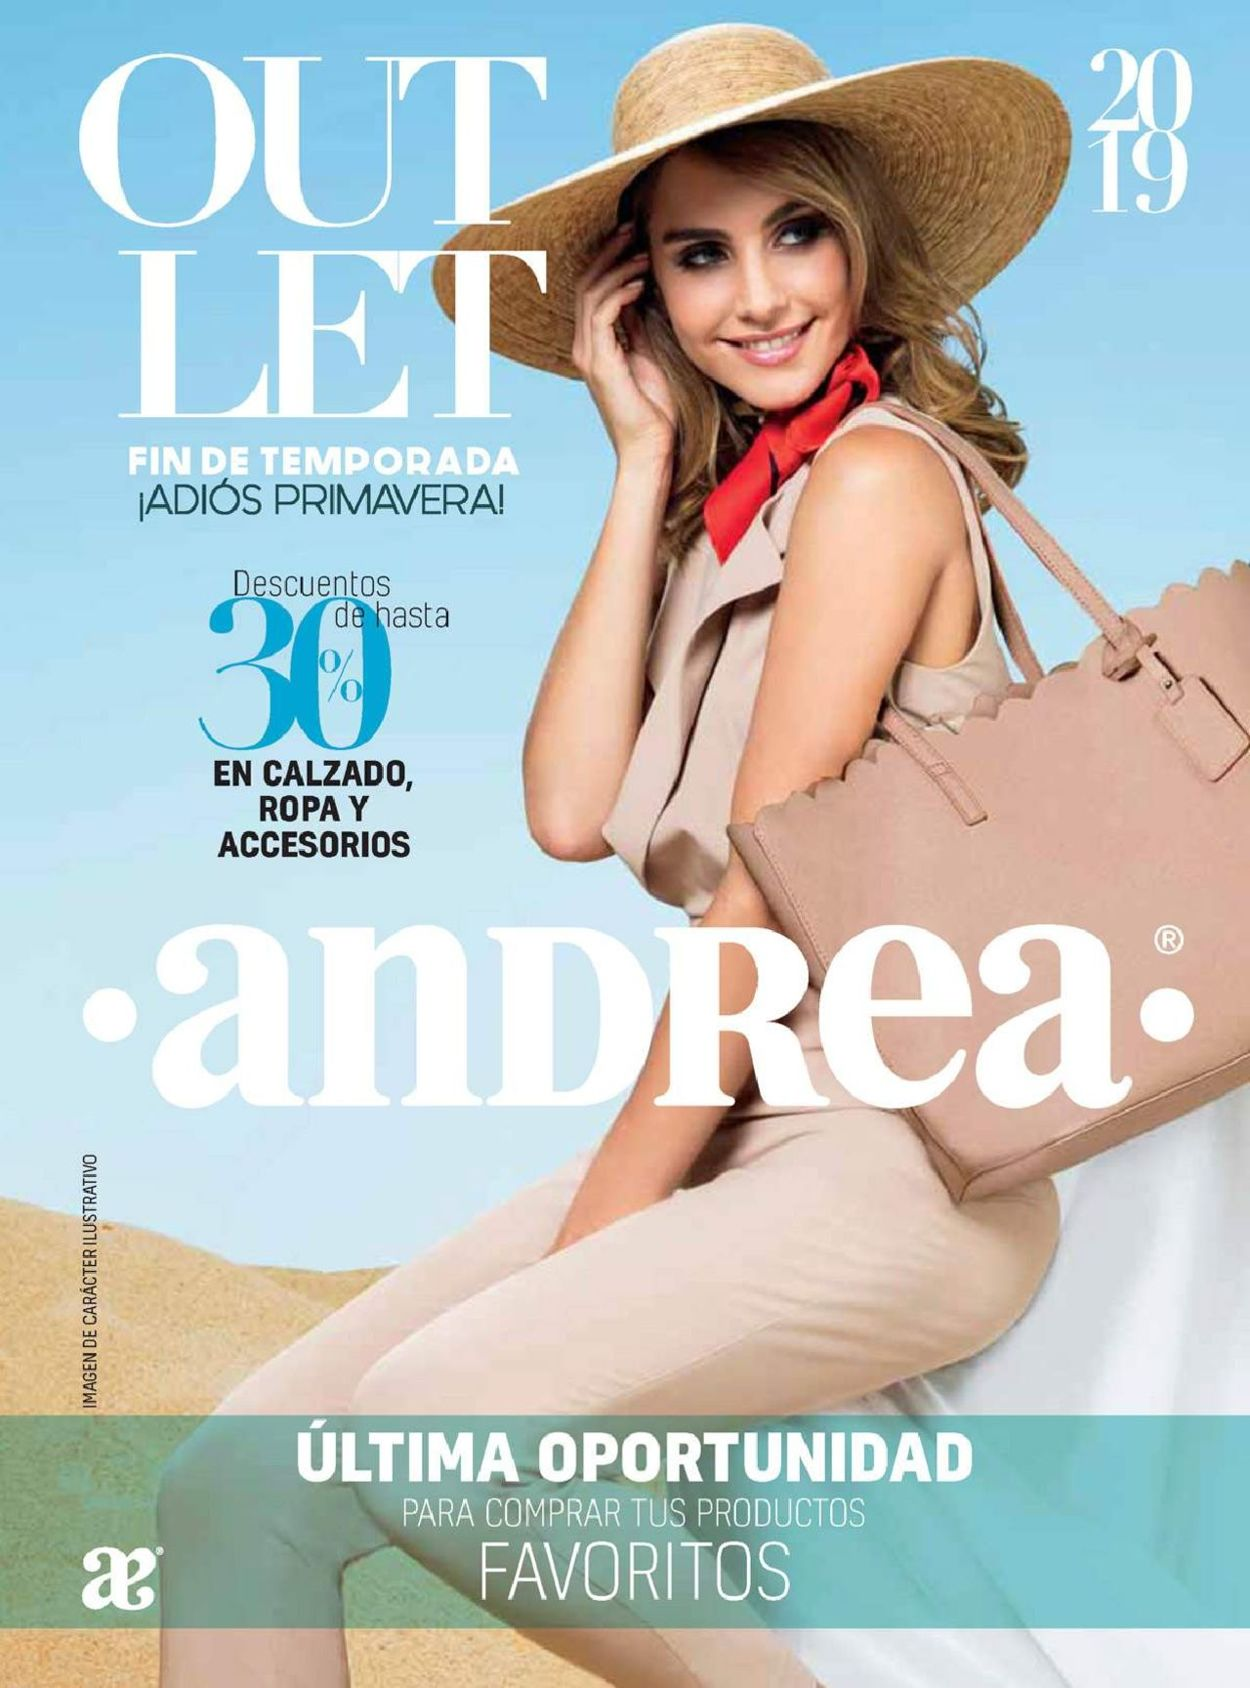 Andrea Folleto - 06.05-06.07.2019